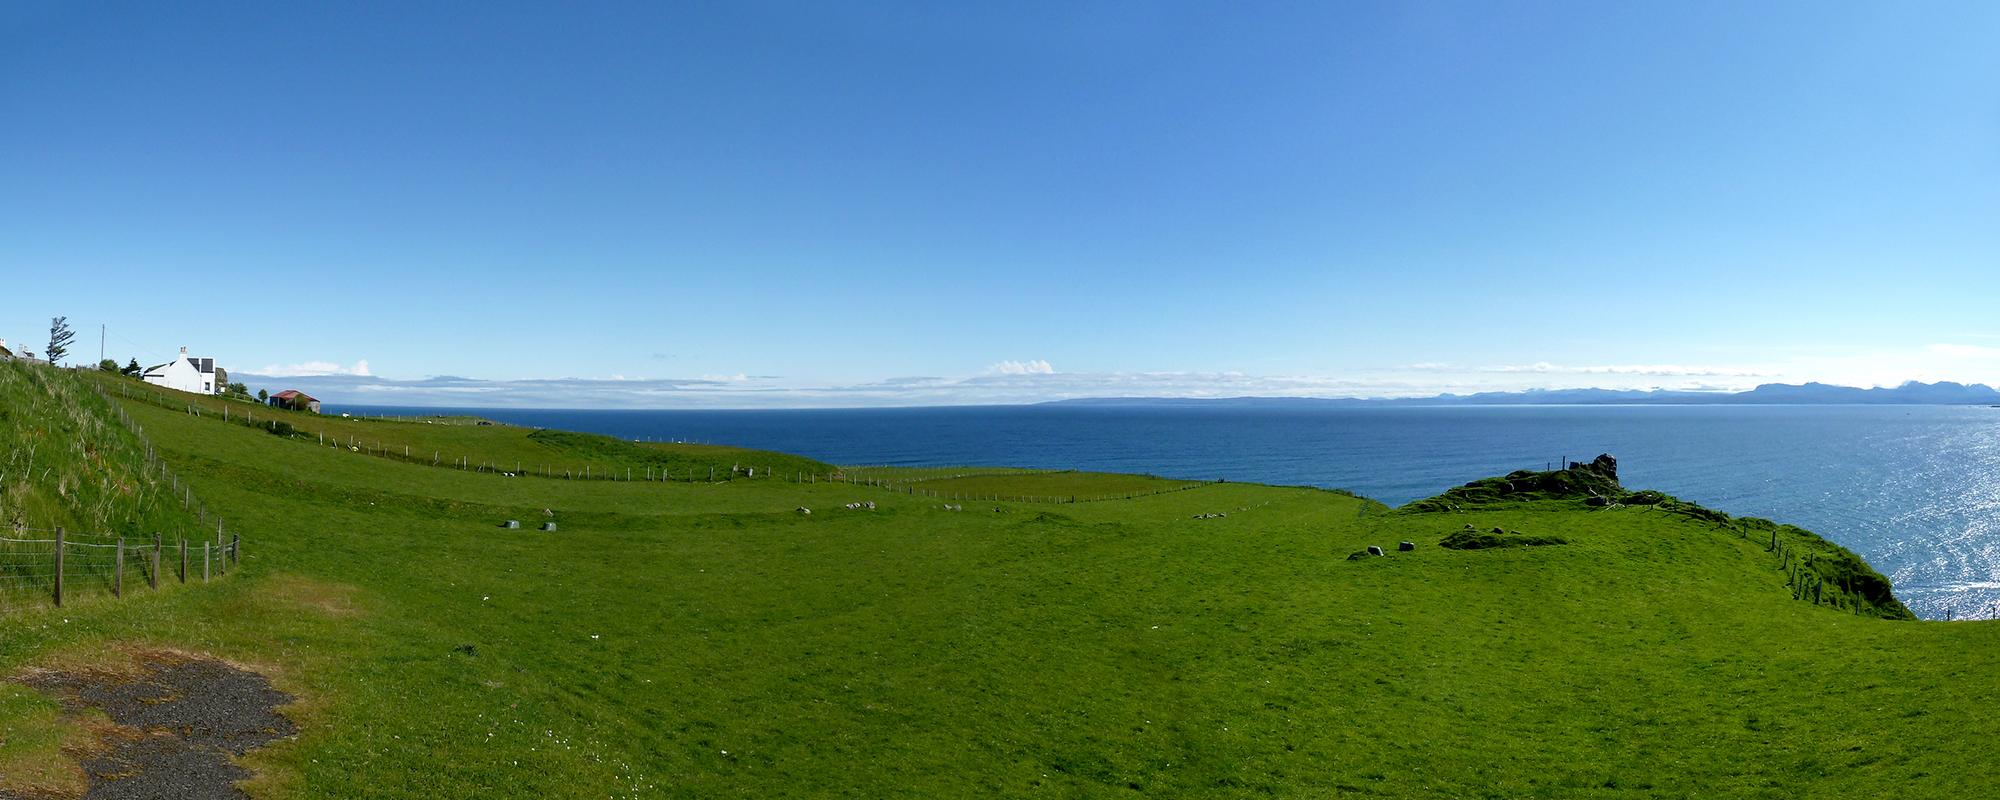 http://www.keytoyourself.at/wp-content/uploads/2018/03/Culnacnoc-Isle-of-Skye_2000x800.jpg